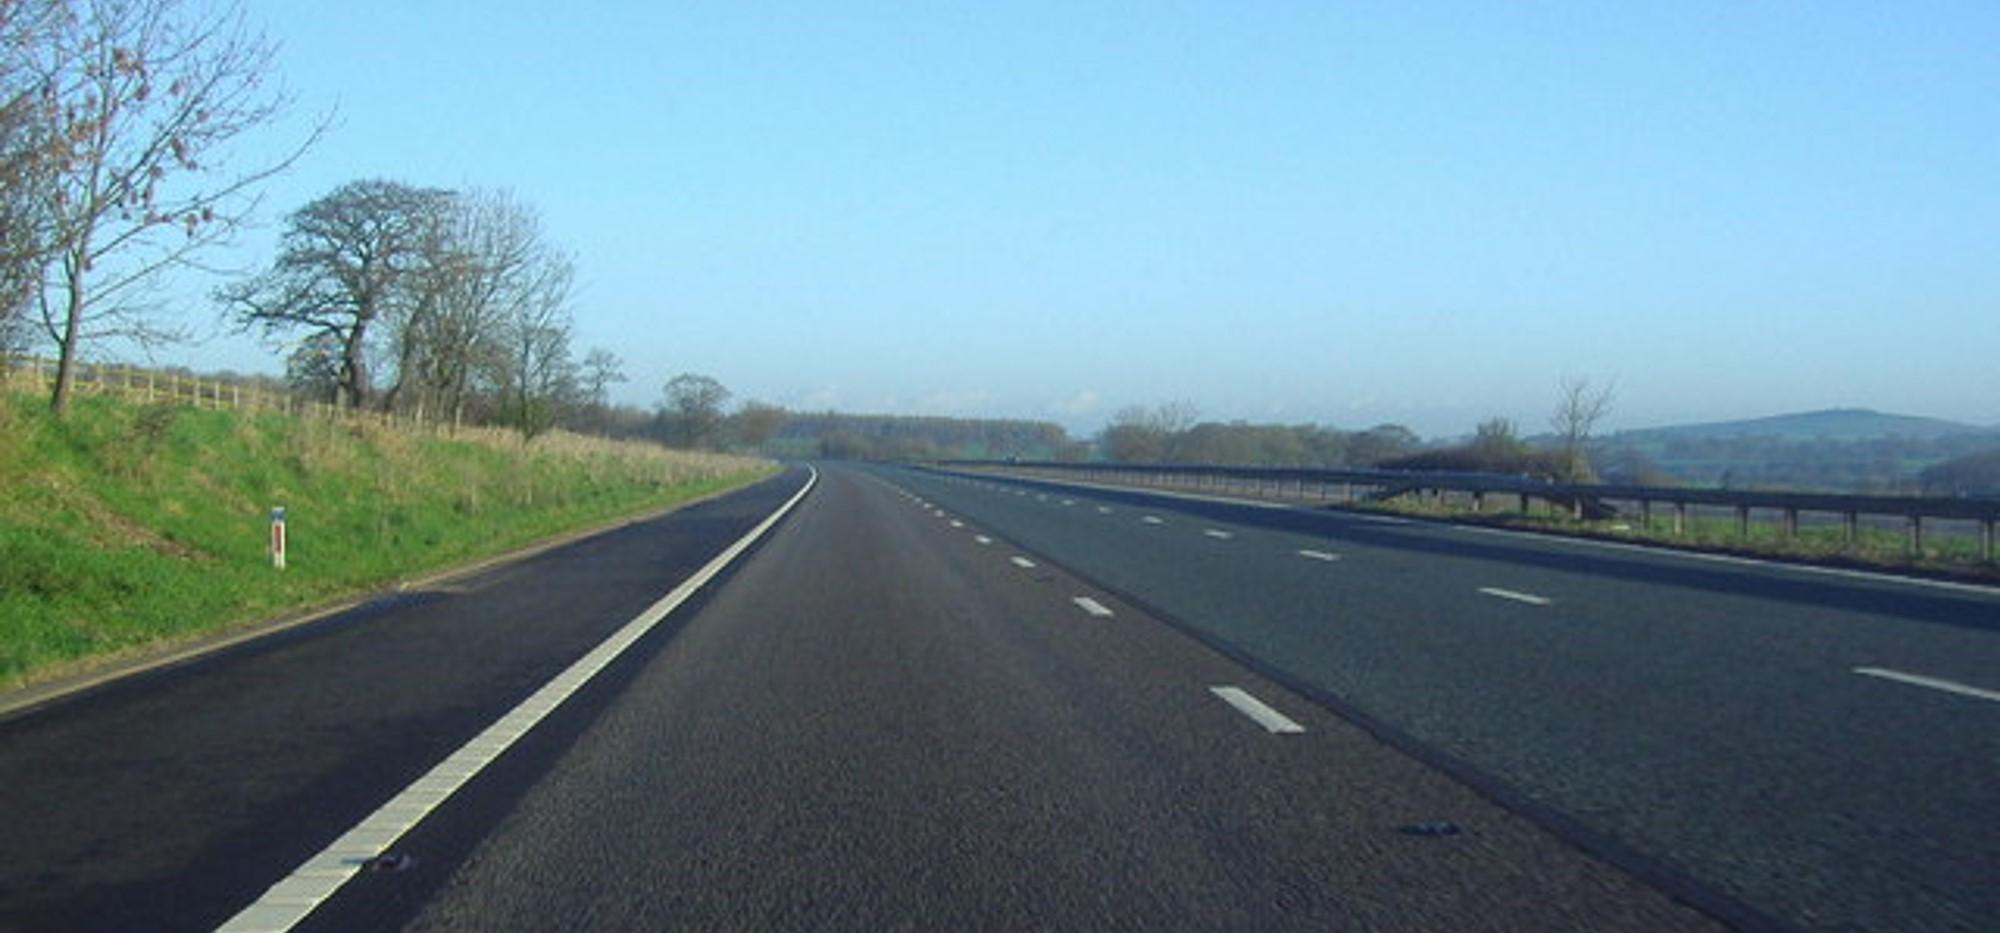 Empty Open Road